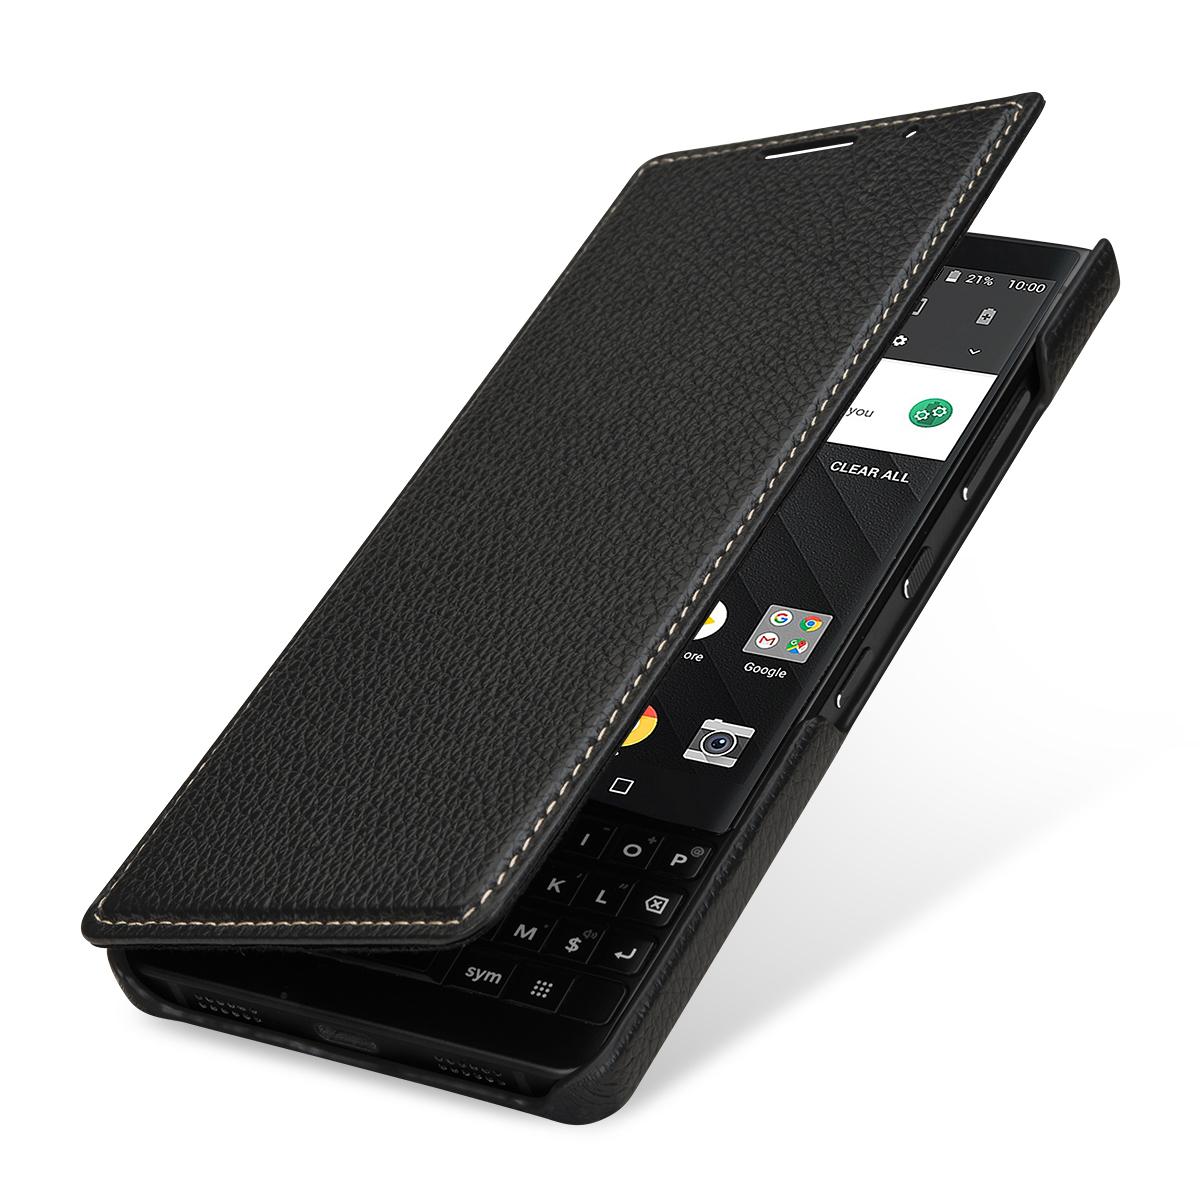 zbook blackberry